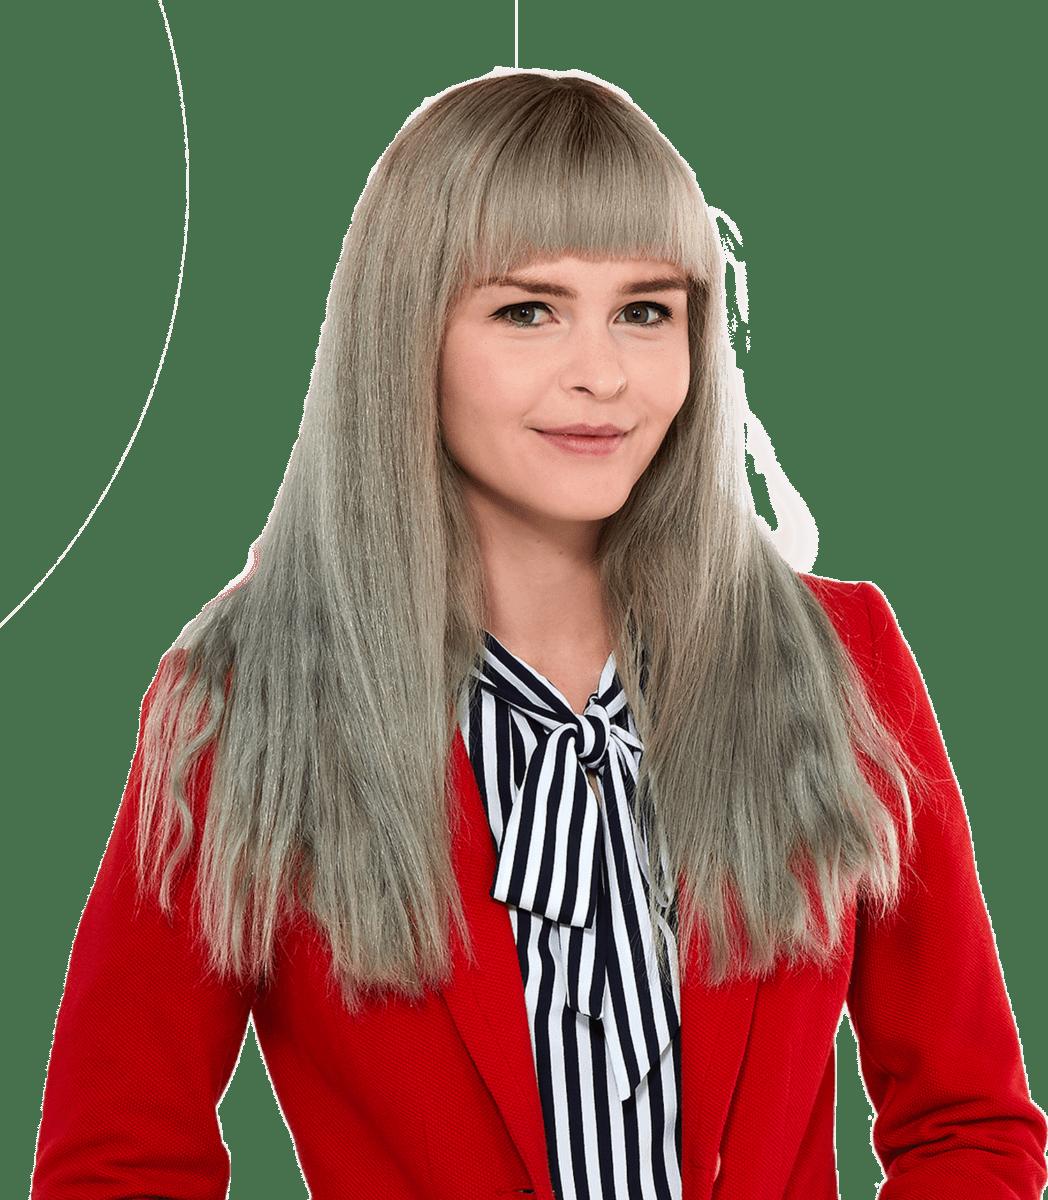 Vanessa Rosenegger